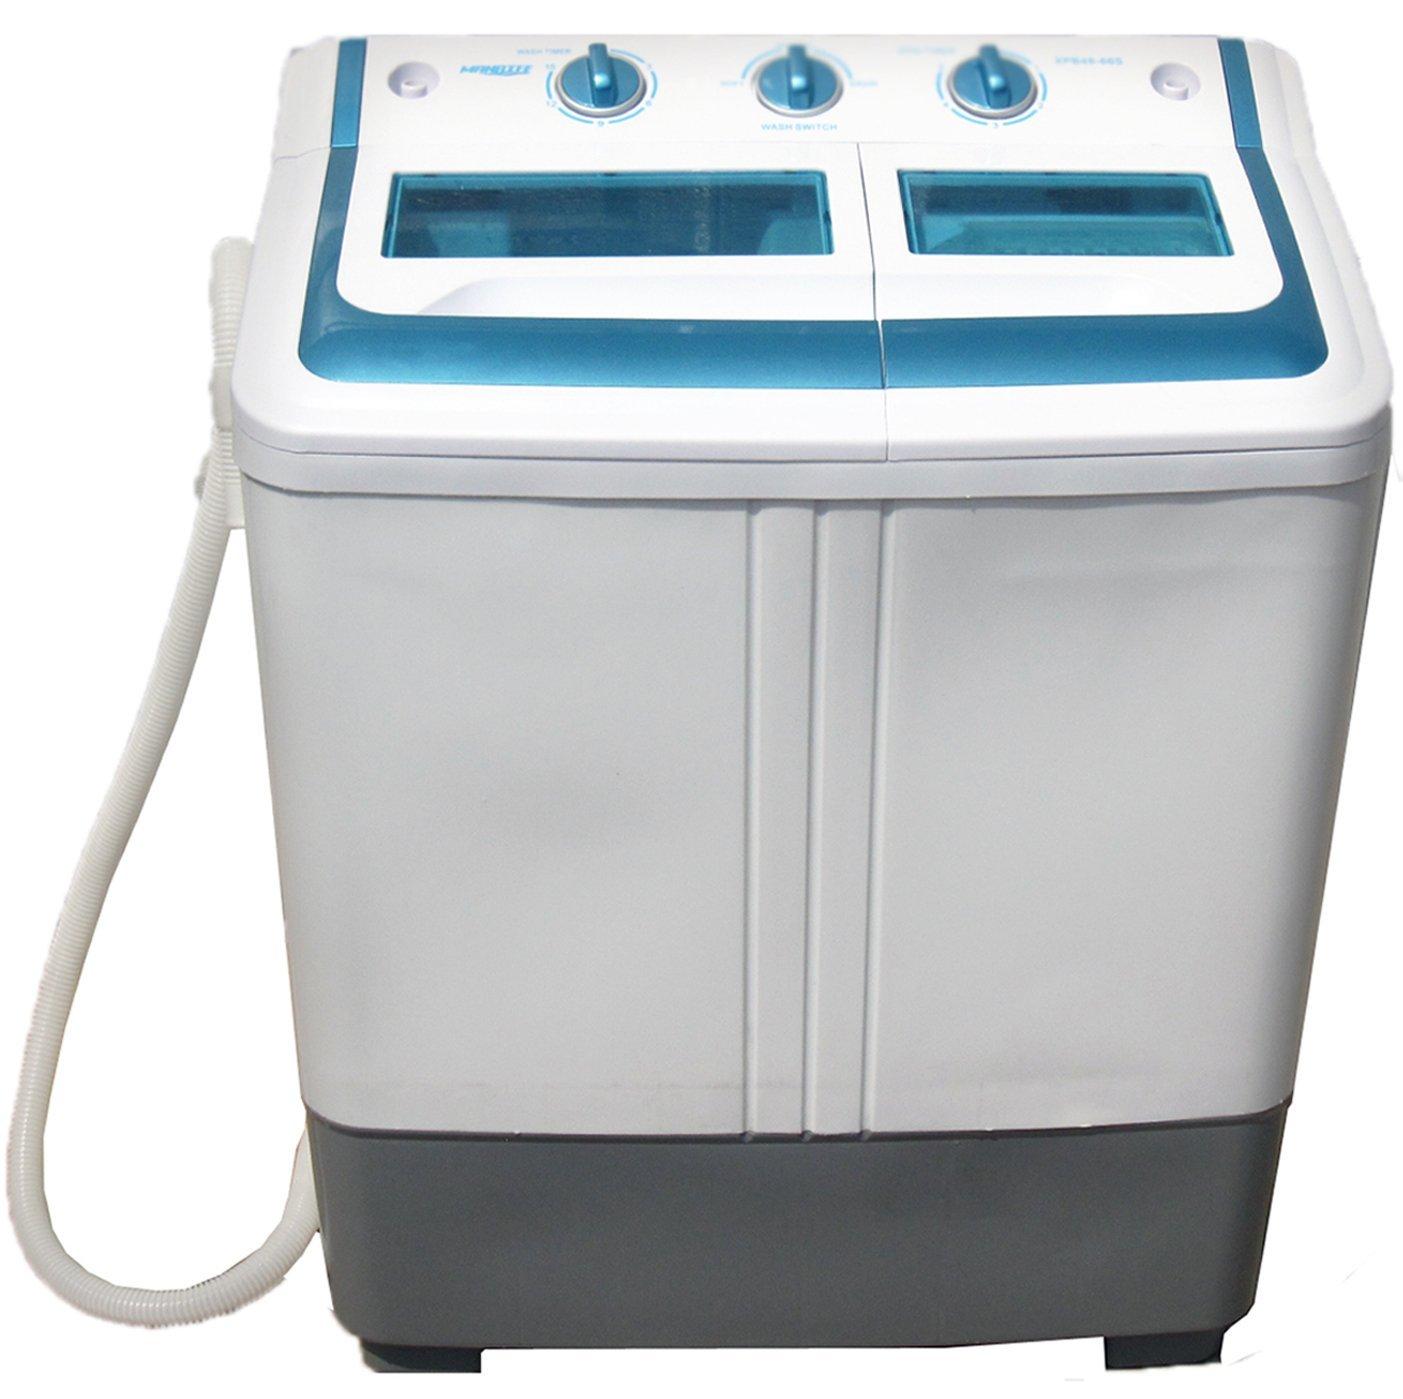 Washers Reviews: Mini Washing Machine (11 Lbs Capacity